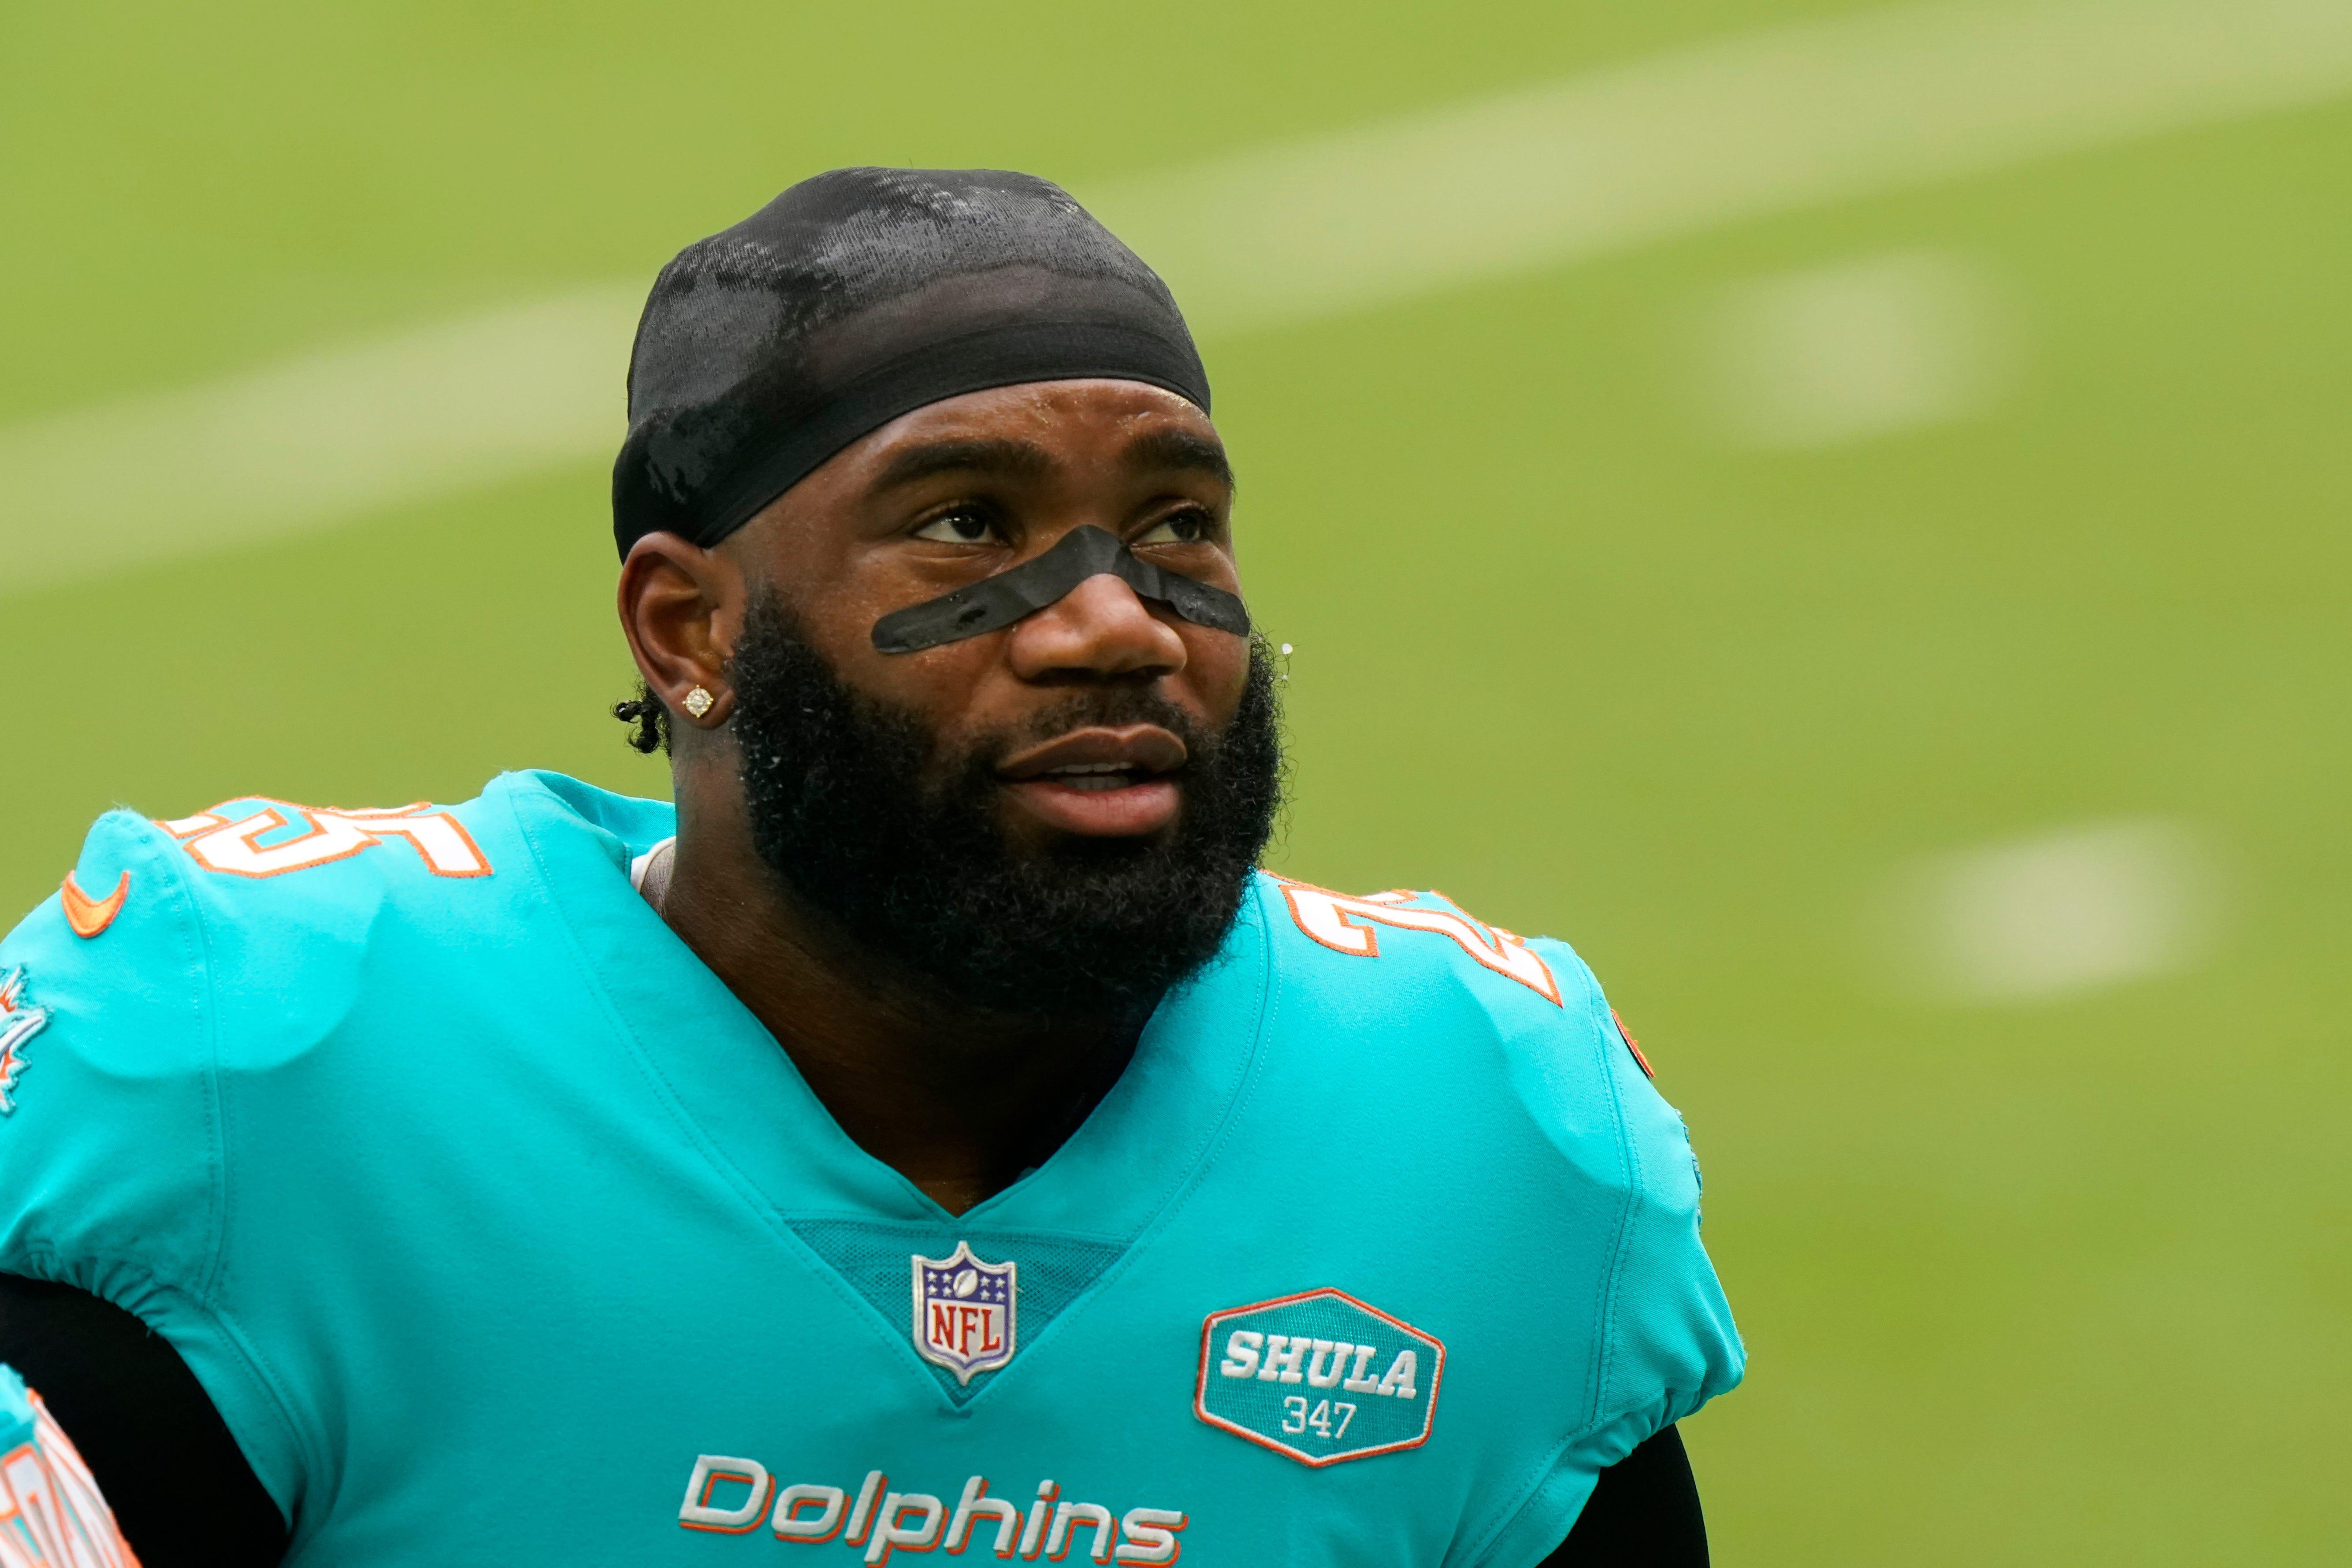 Pro Bowl CB Xavien Howard not present at Dolphins' mandatory minicamp